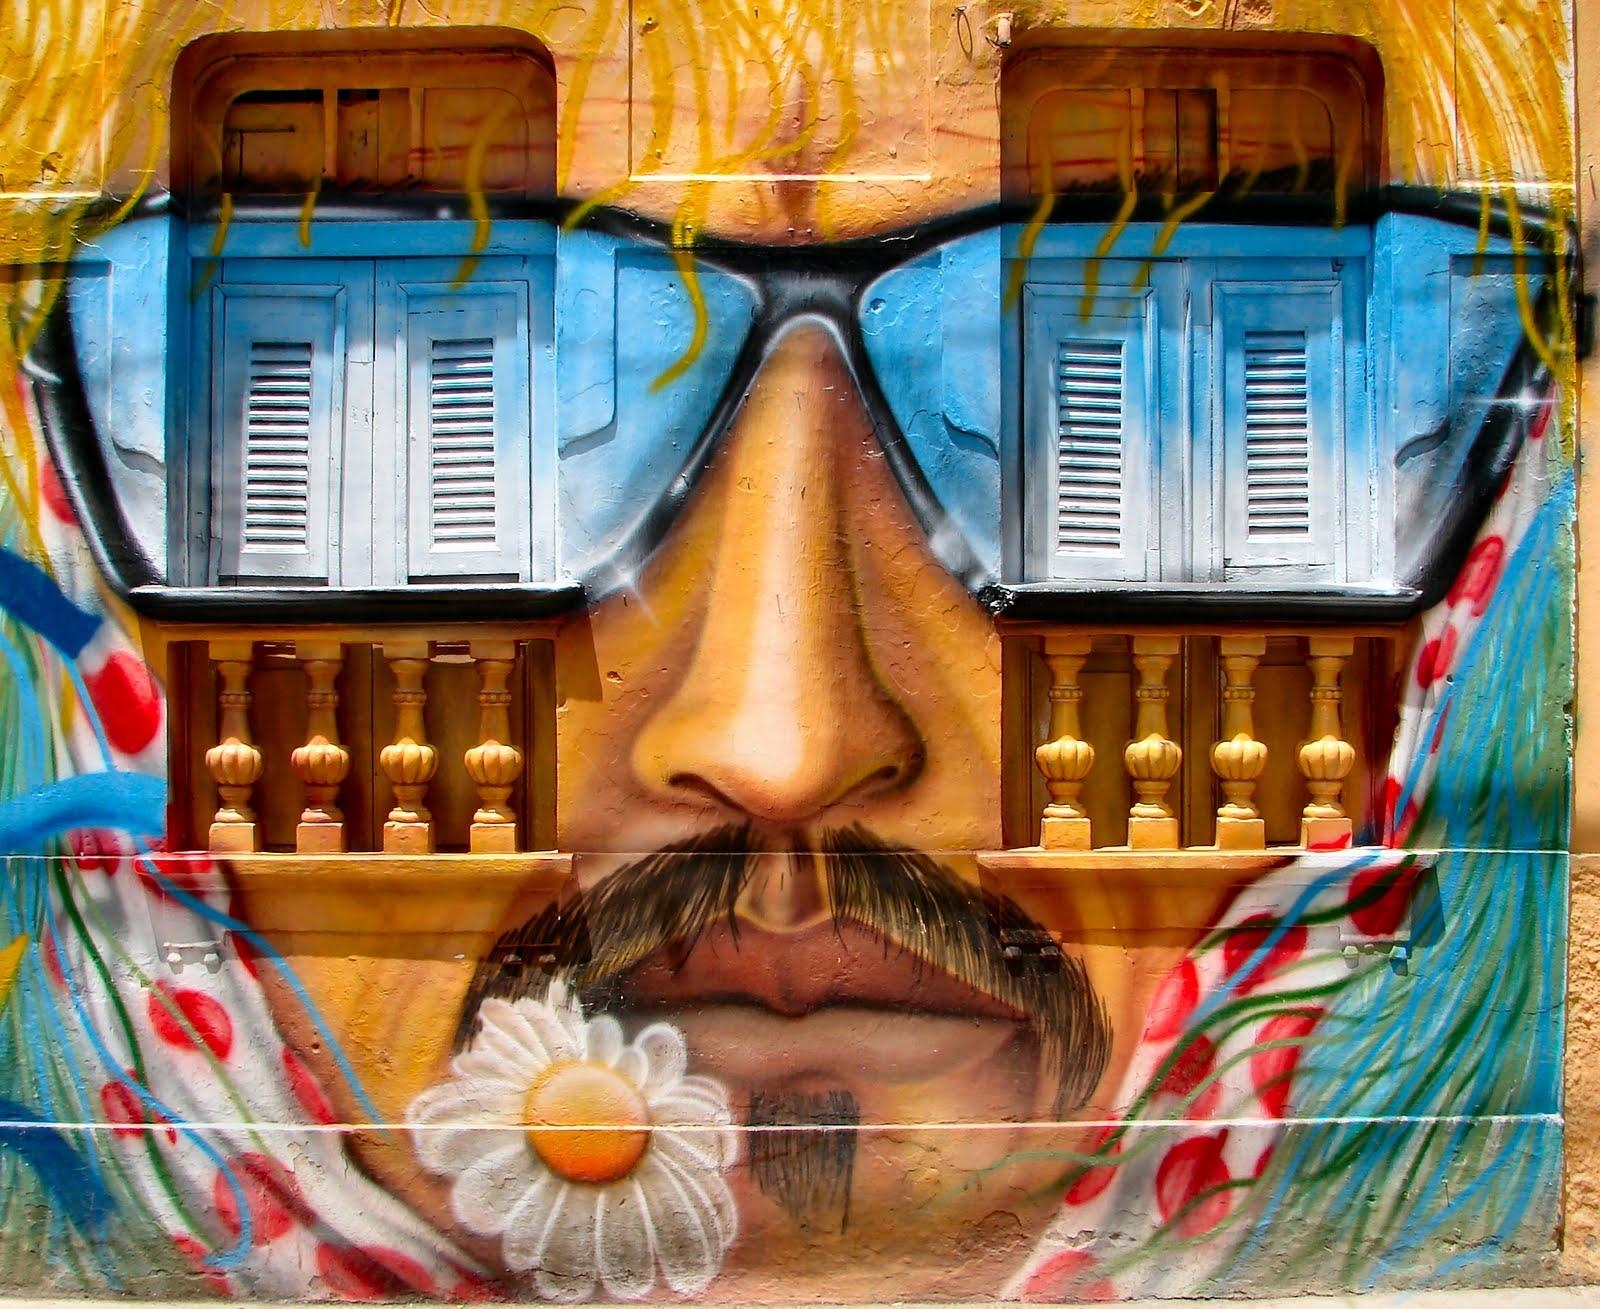 http://3.bp.blogspot.com/-vDHKFSRNcRk/TmoA7FFaZfI/AAAAAAAACWM/y6Nor0yM7wI/s1600/OlindaGraffiti.jpg